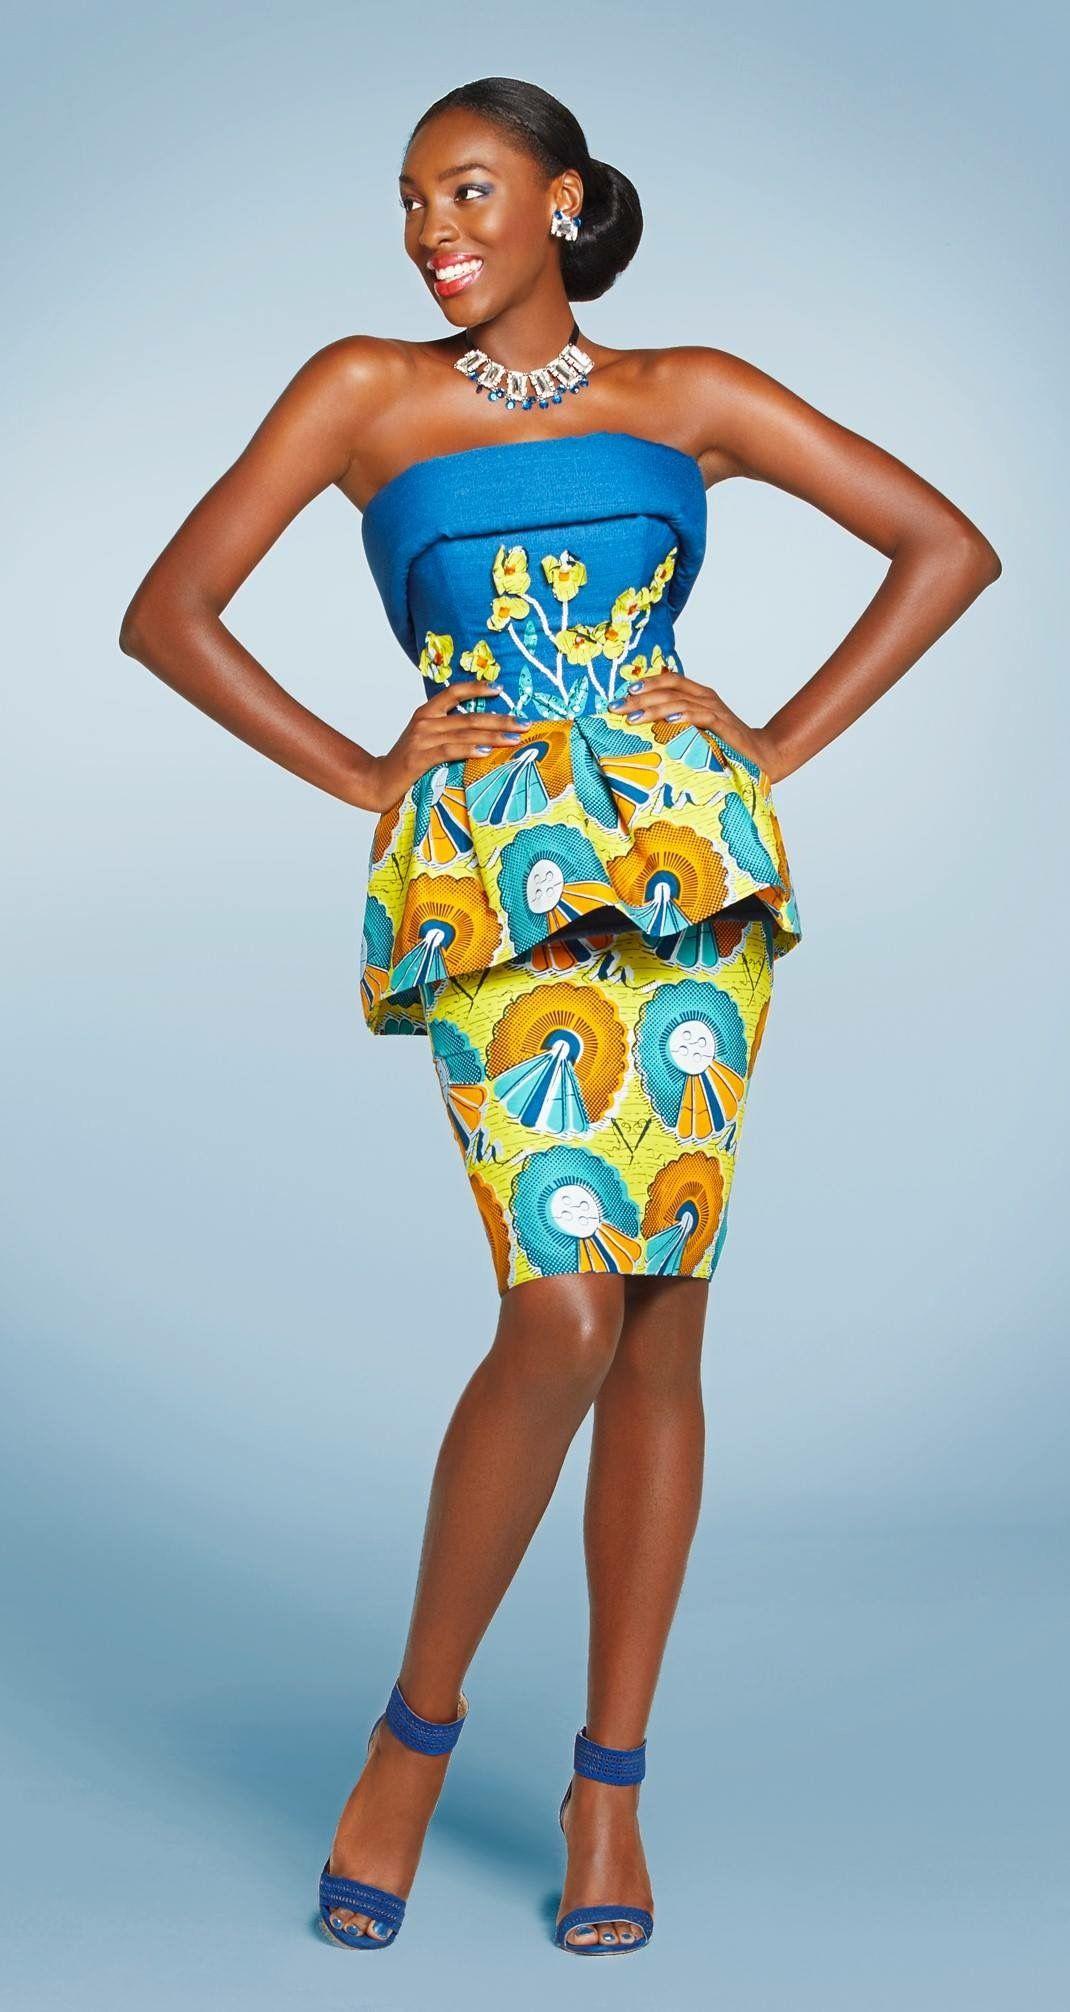 gilles toure cocktail1 mode femme pinterest ivoirien avant gardiste et mode africaine. Black Bedroom Furniture Sets. Home Design Ideas